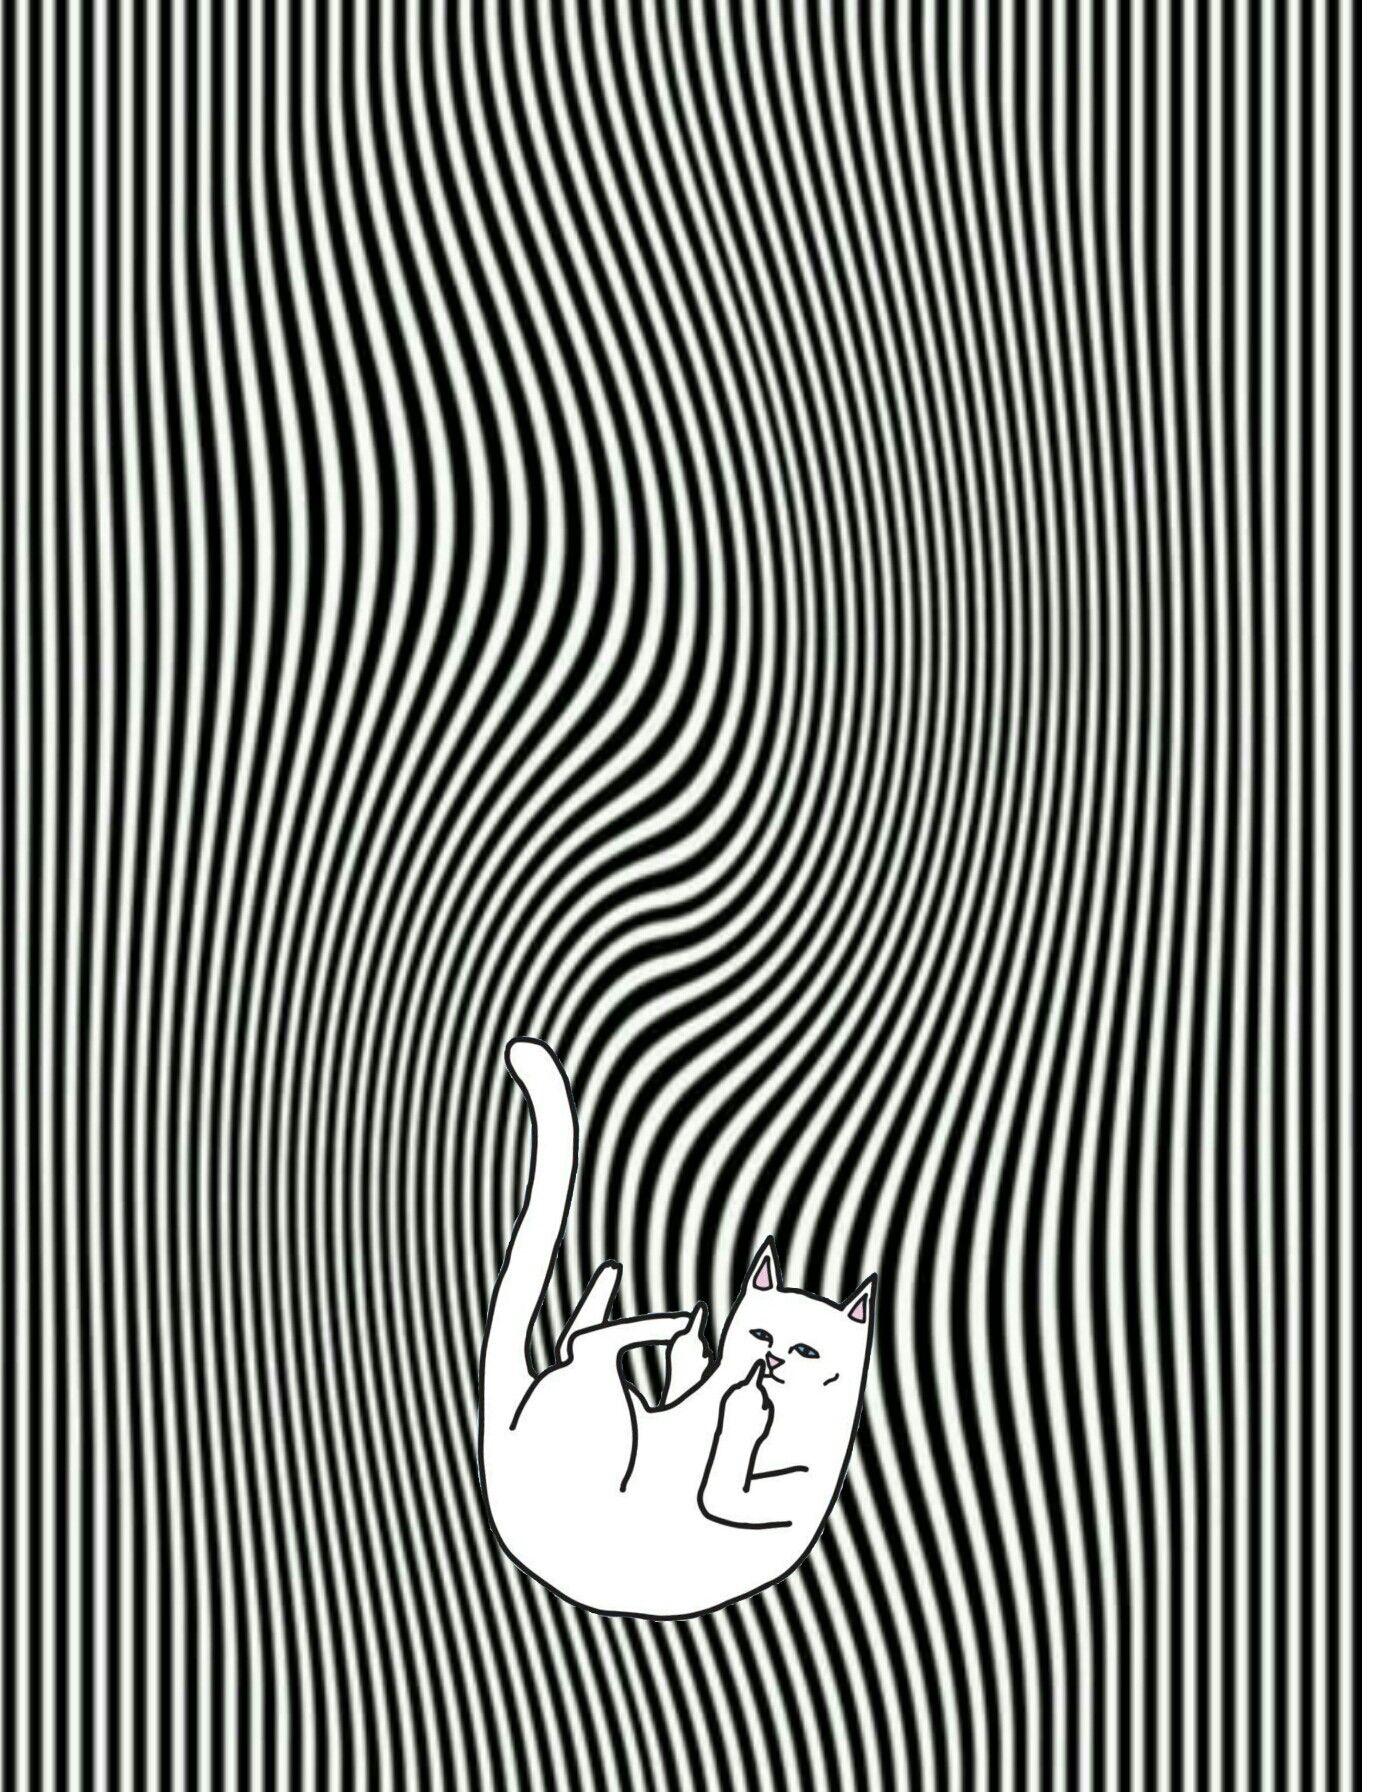 #ripndip #middle #finger #cat #wallpaper #iphone | Ripndip ...